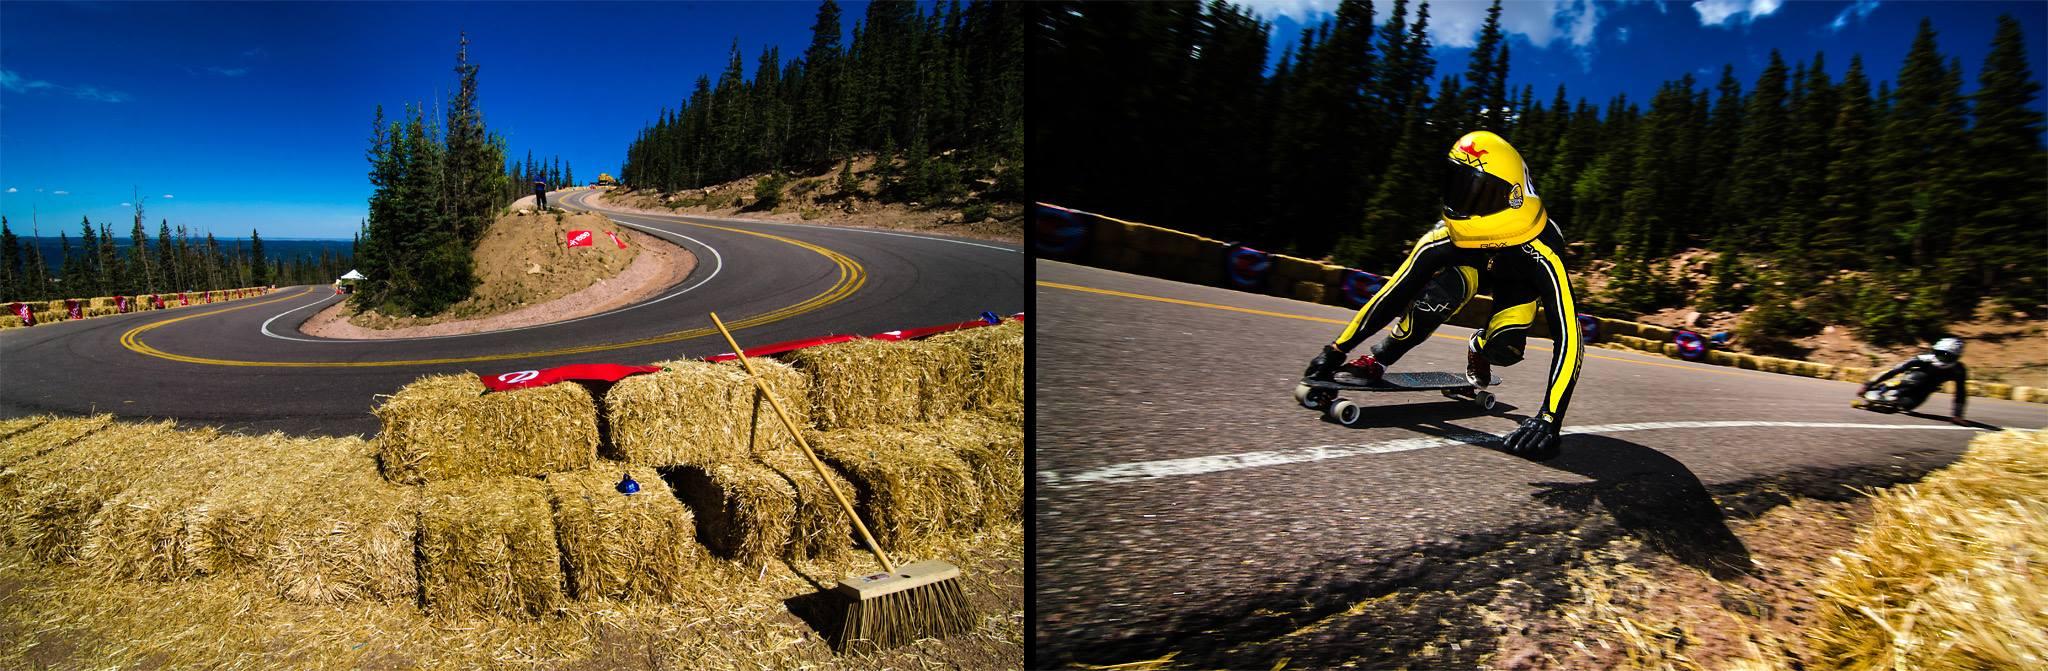 Pikes Peak Downhill Track